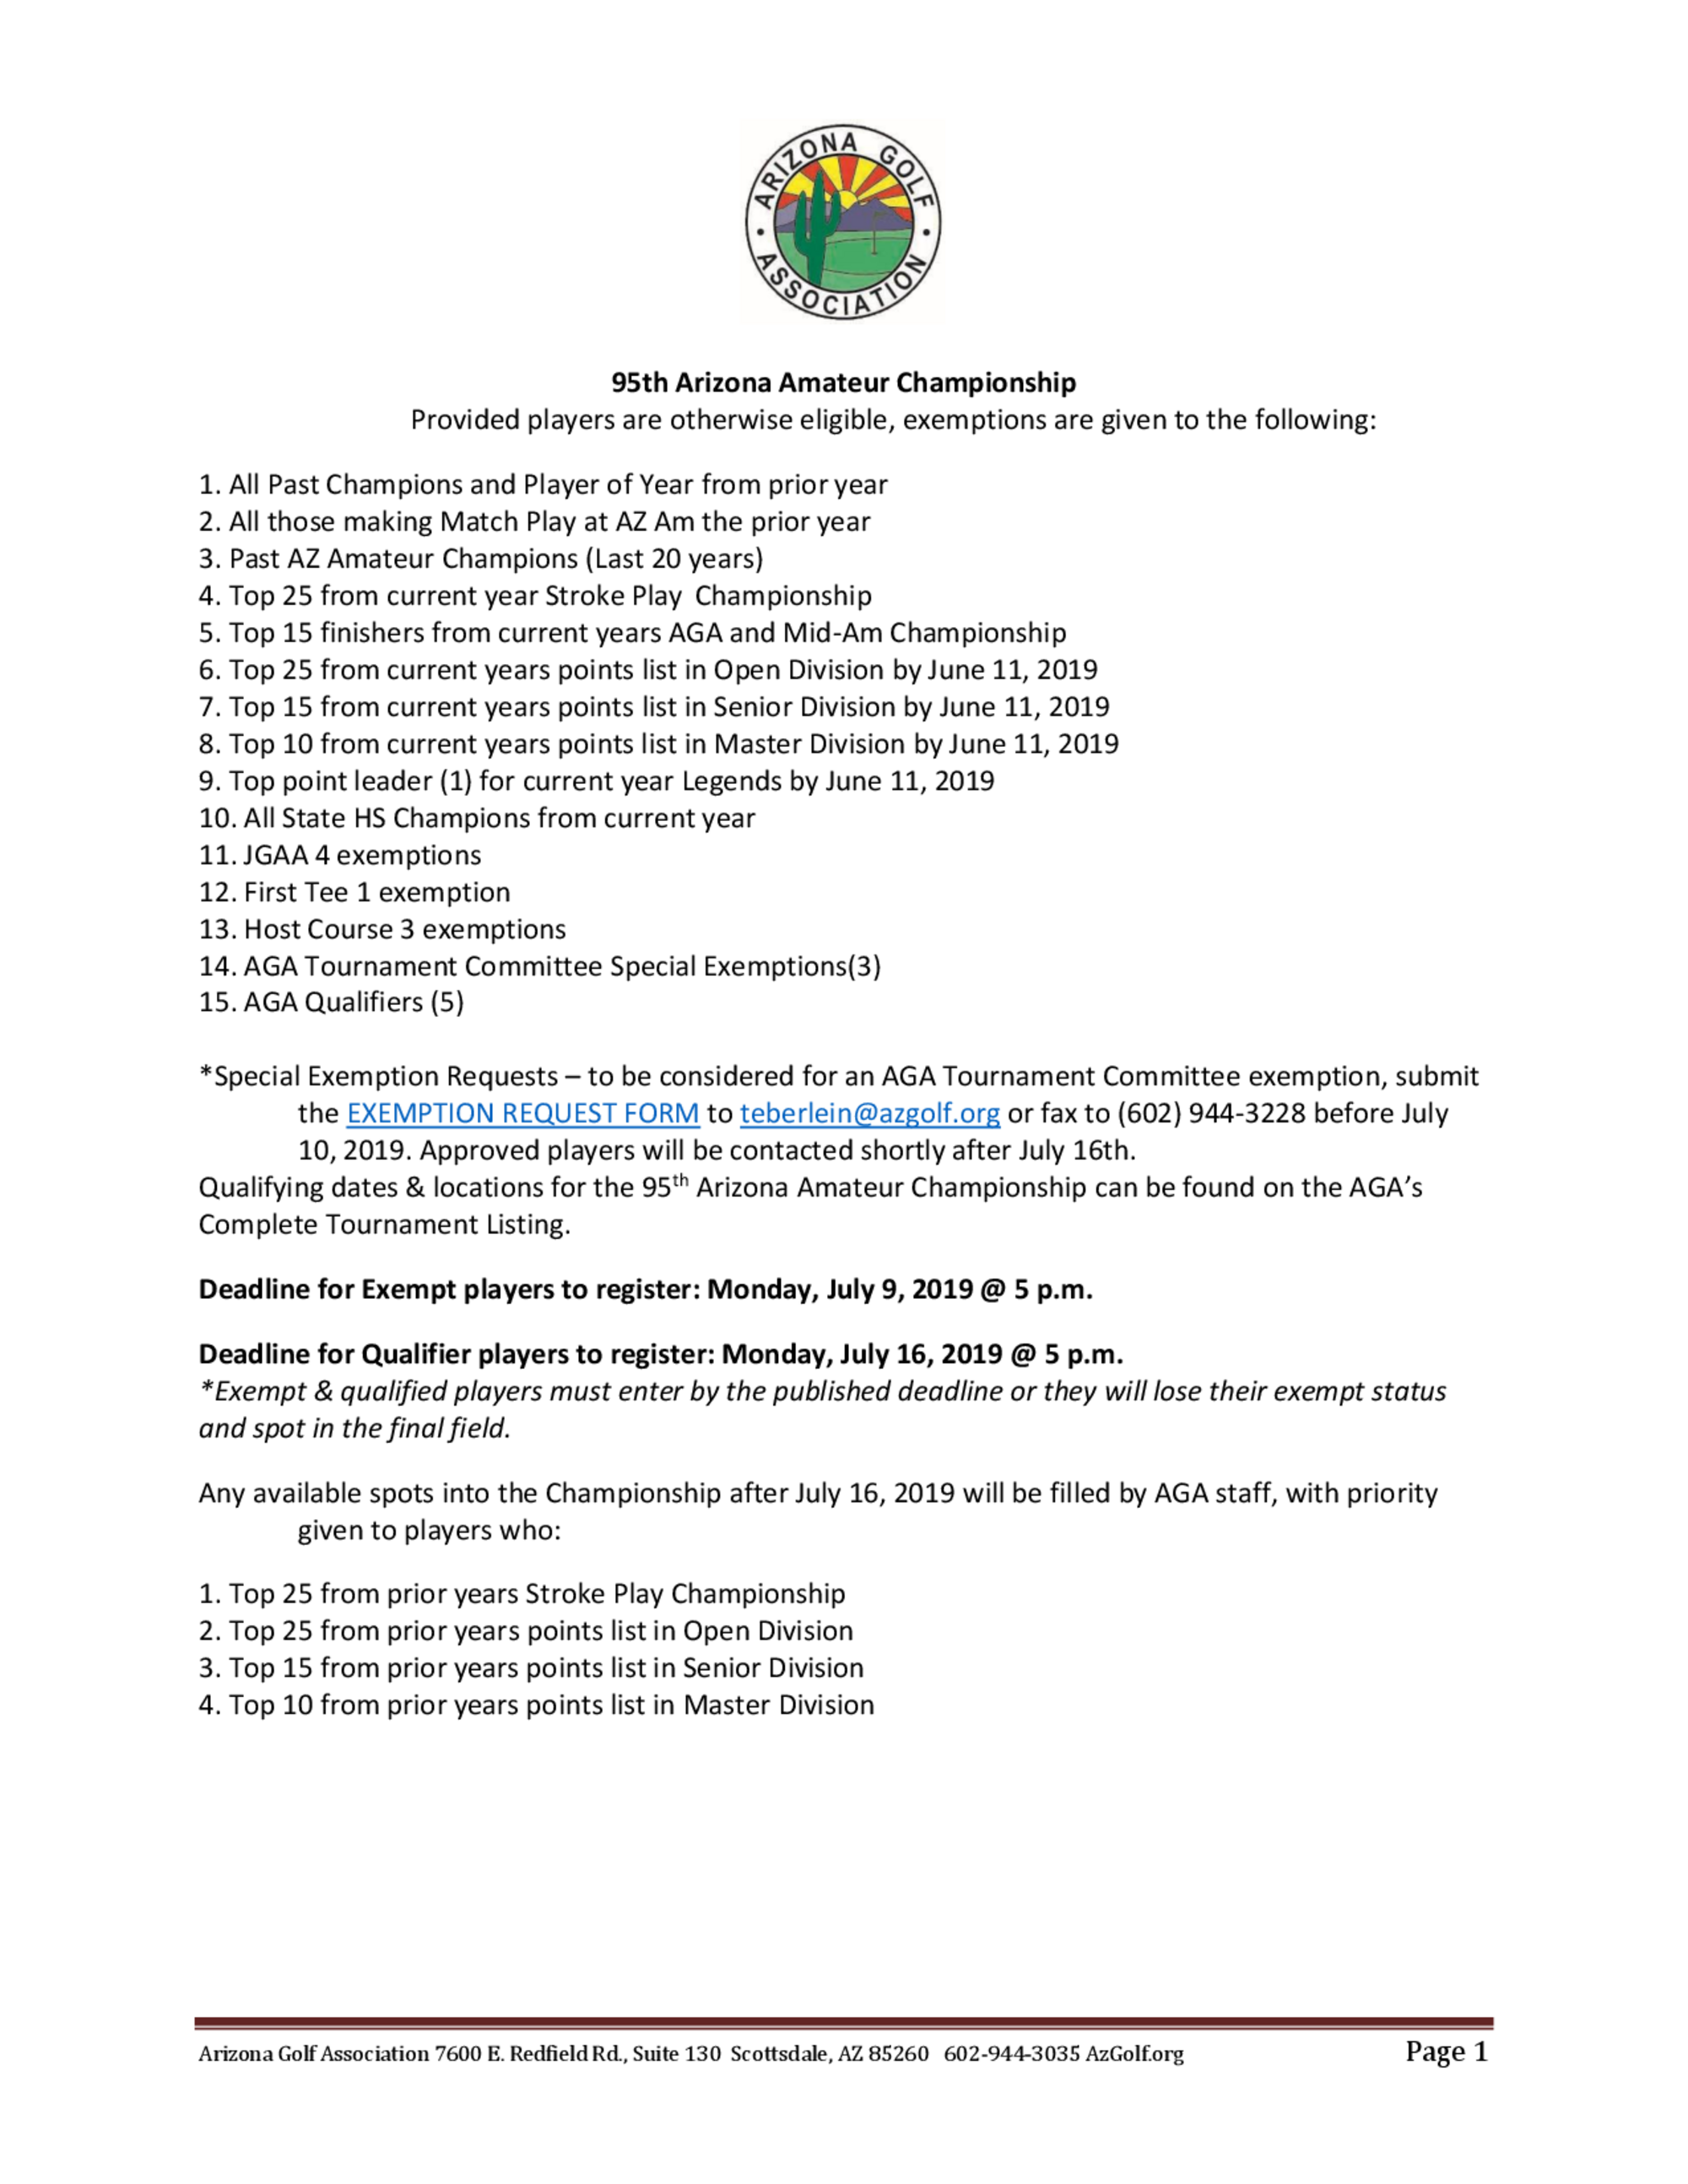 95th arizona amateur   exemption list 1